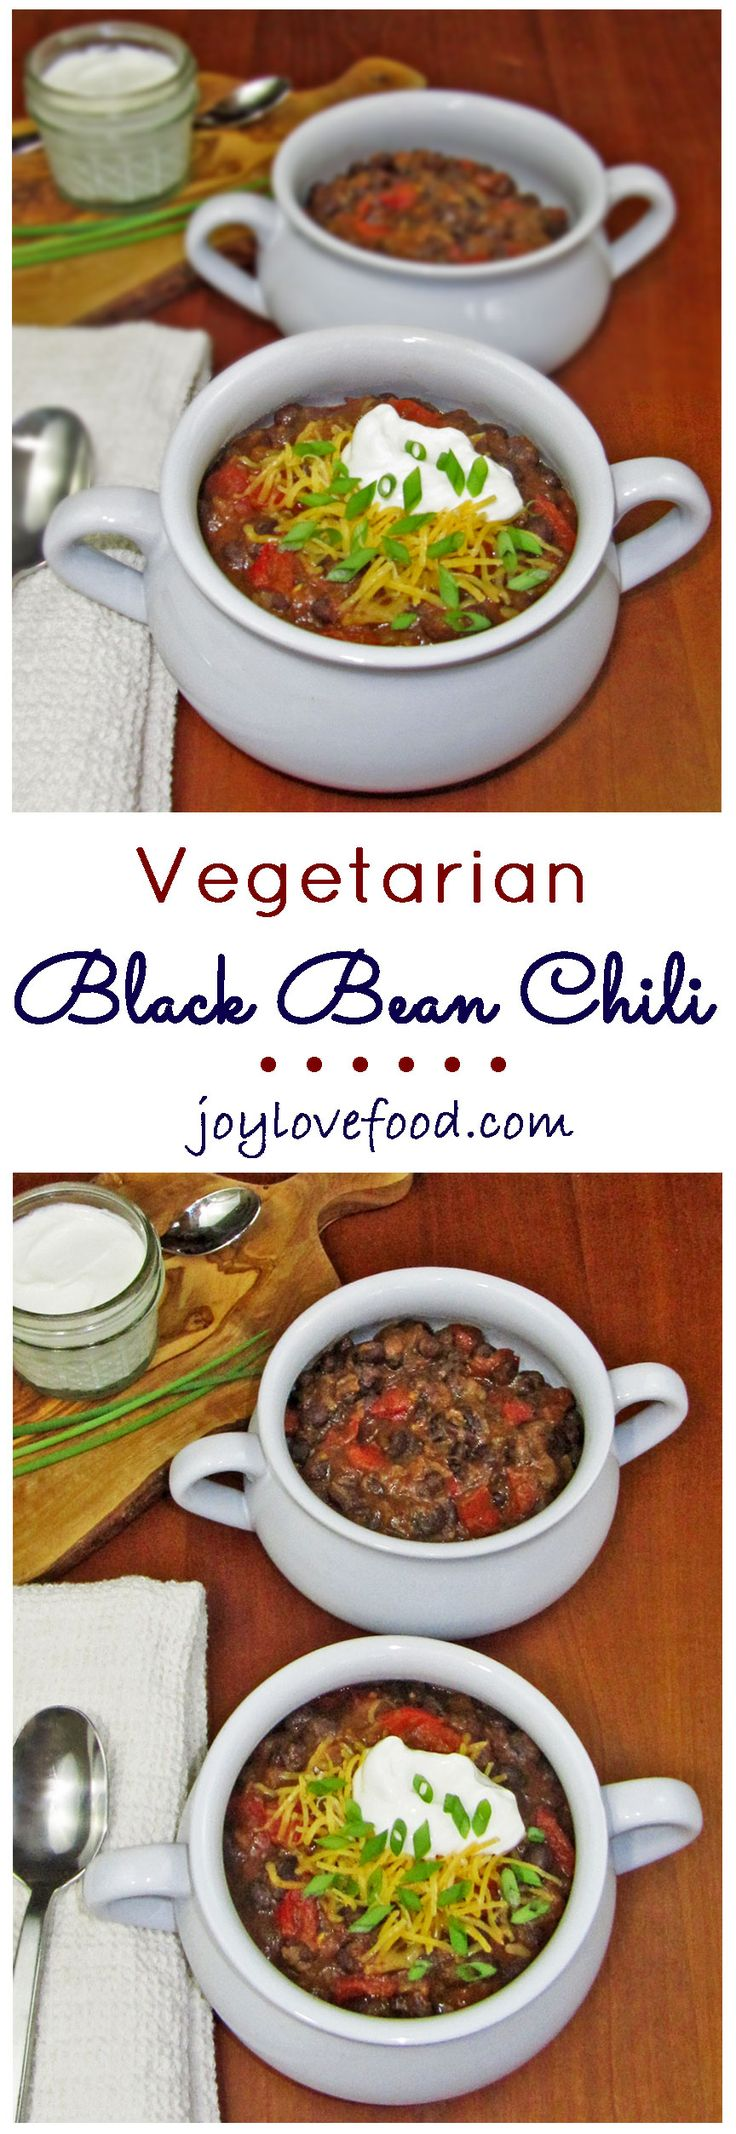 Vegetarian Black Bean Chili | Recipe | Bean chili, Black beans and ...